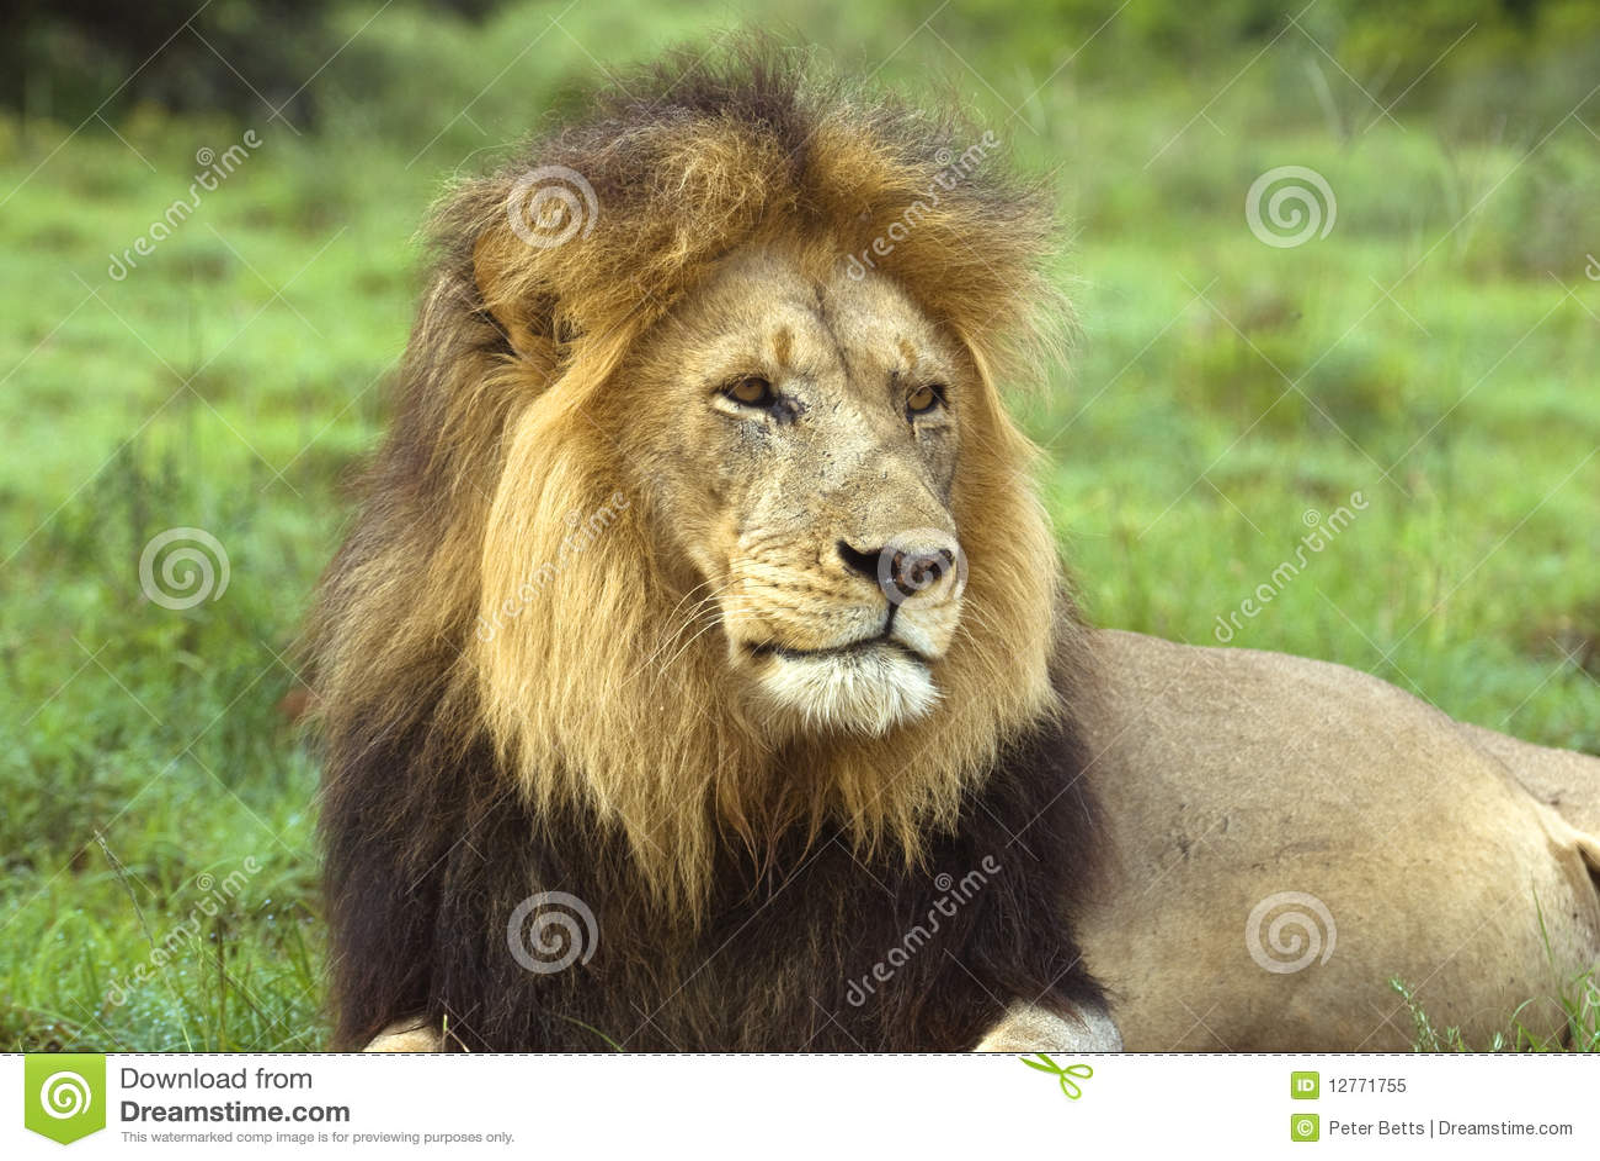 African Icon Lion Royalty Free Stock Photo - Image: 12771755: dreamstime.com/royalty-free-stock-photo-african-icon-lion...